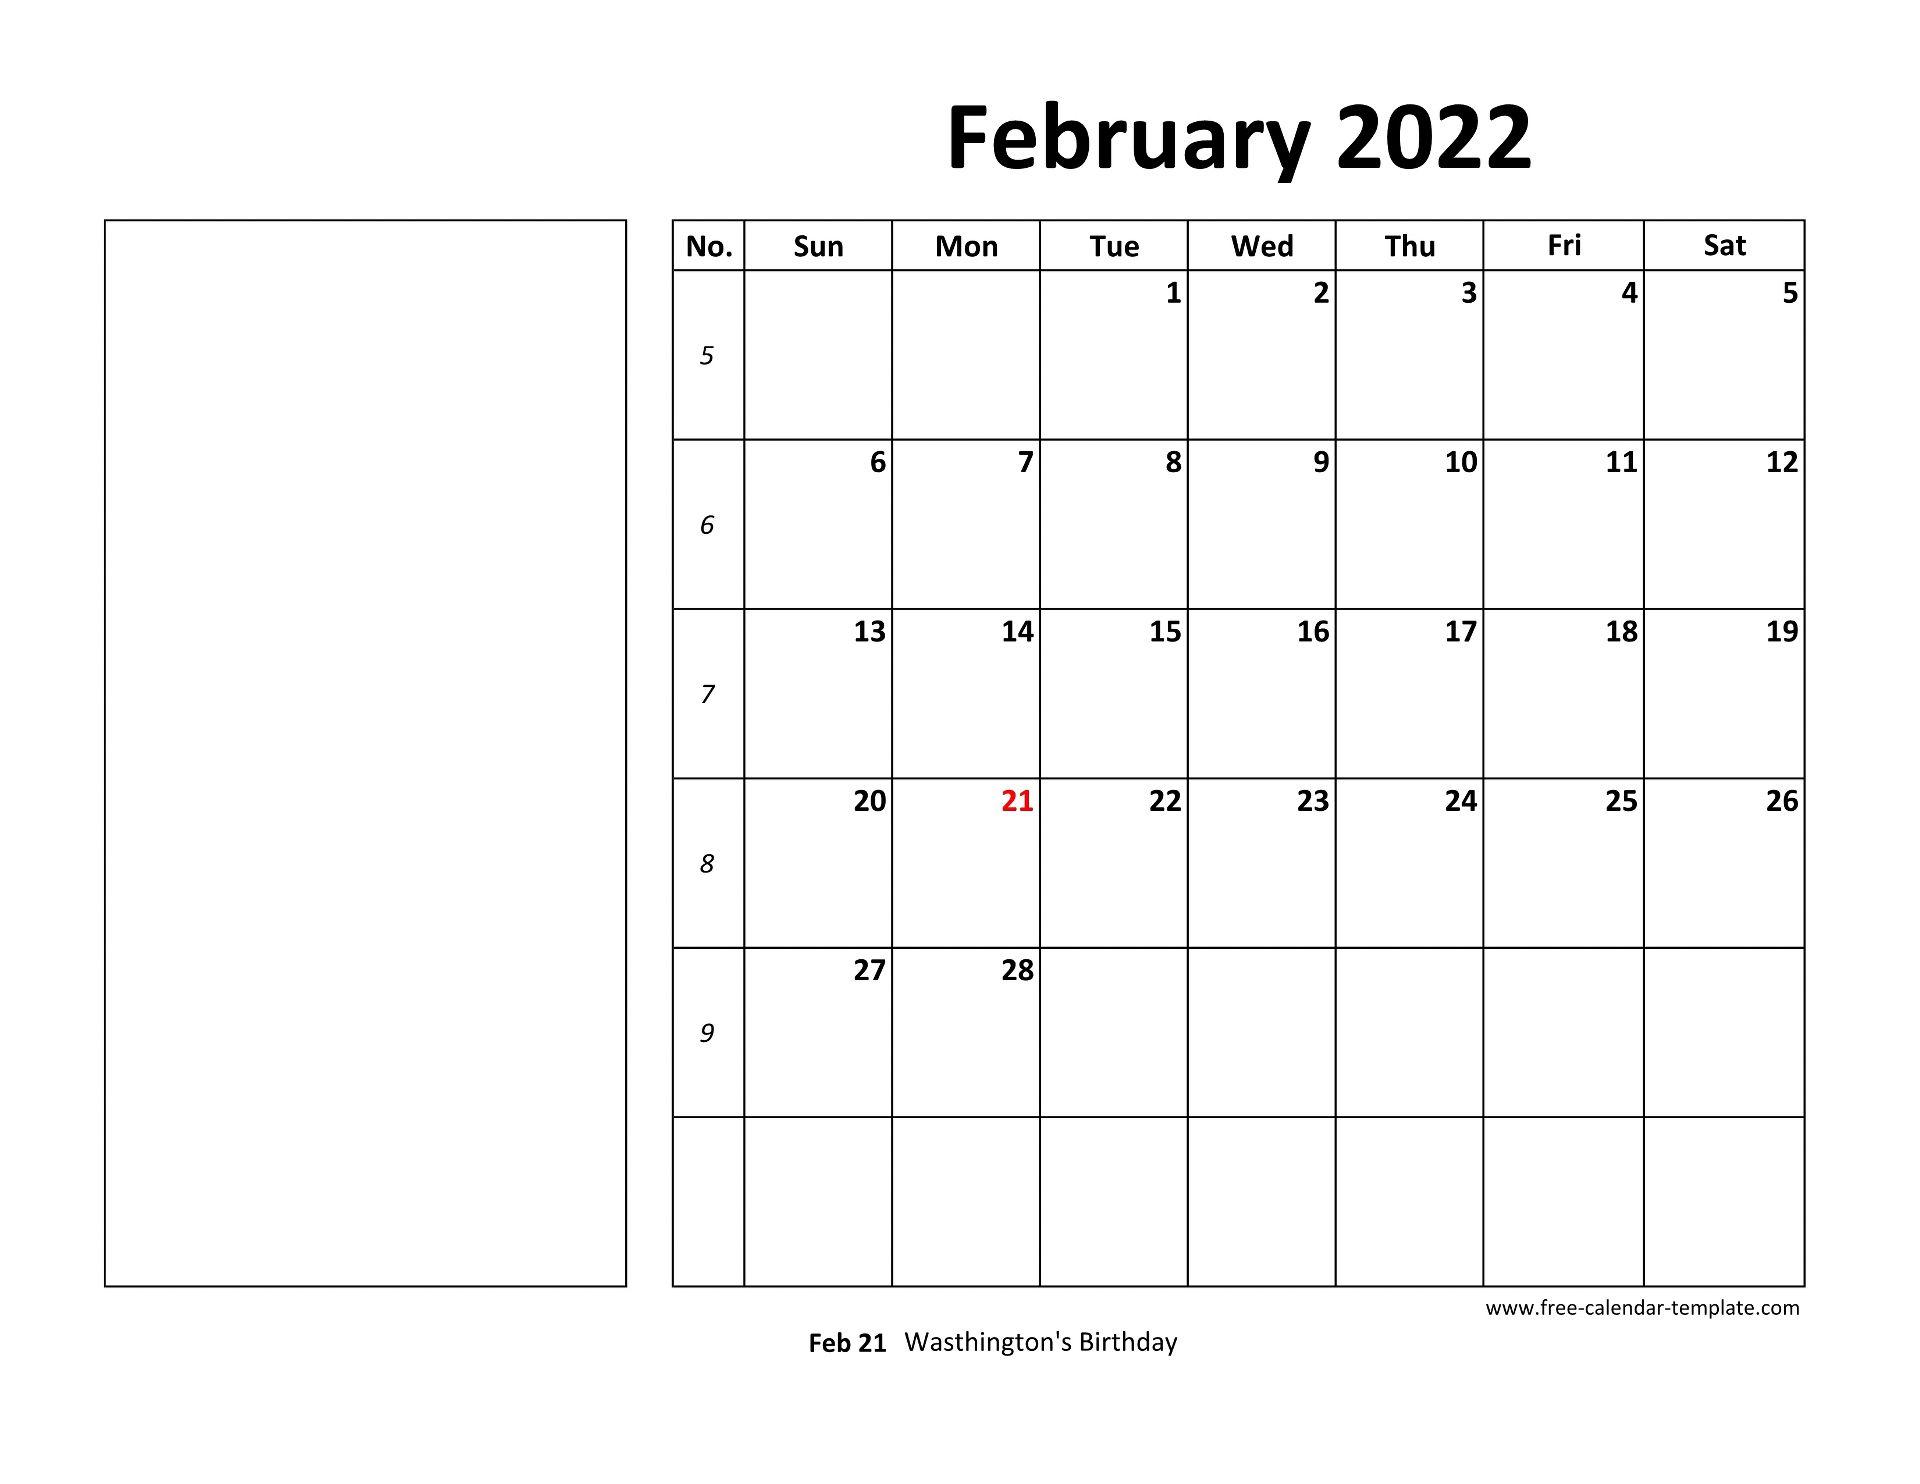 February 2022 Free Calendar Tempplate | Free-calendar ...